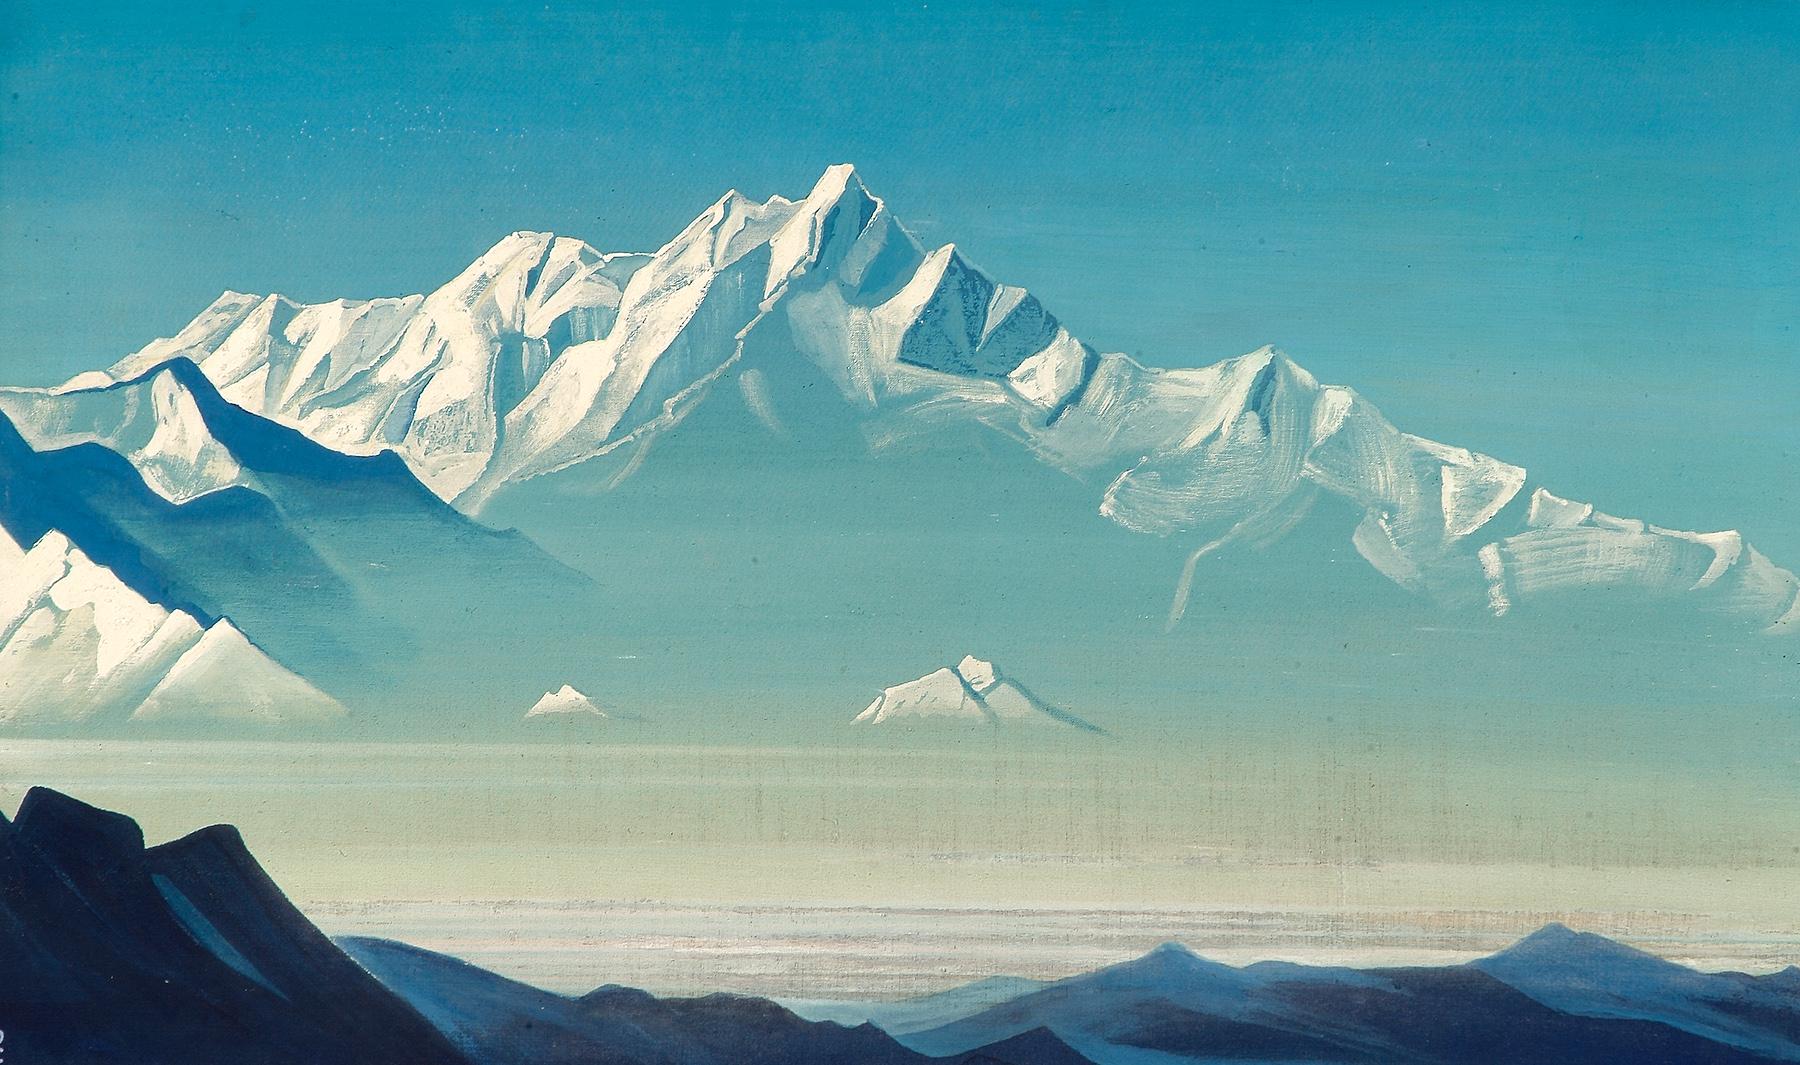 Nicolas Roerich [Peintre] Mount-of-five-treasures-two-worlds-1933